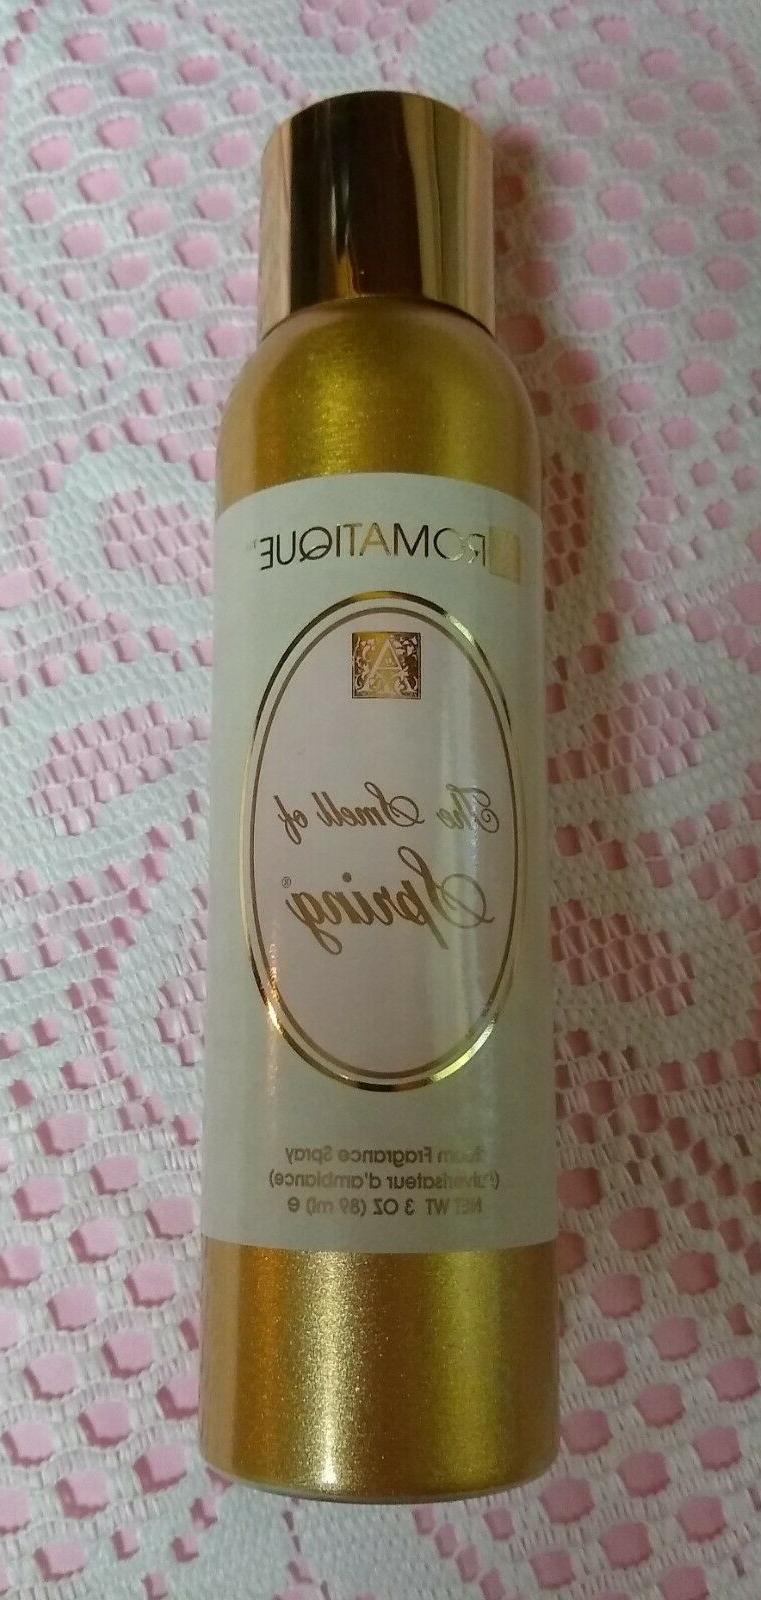 "Aromatique ""The Smell of Spring"" 3 oz. Room Fragrance Spray"